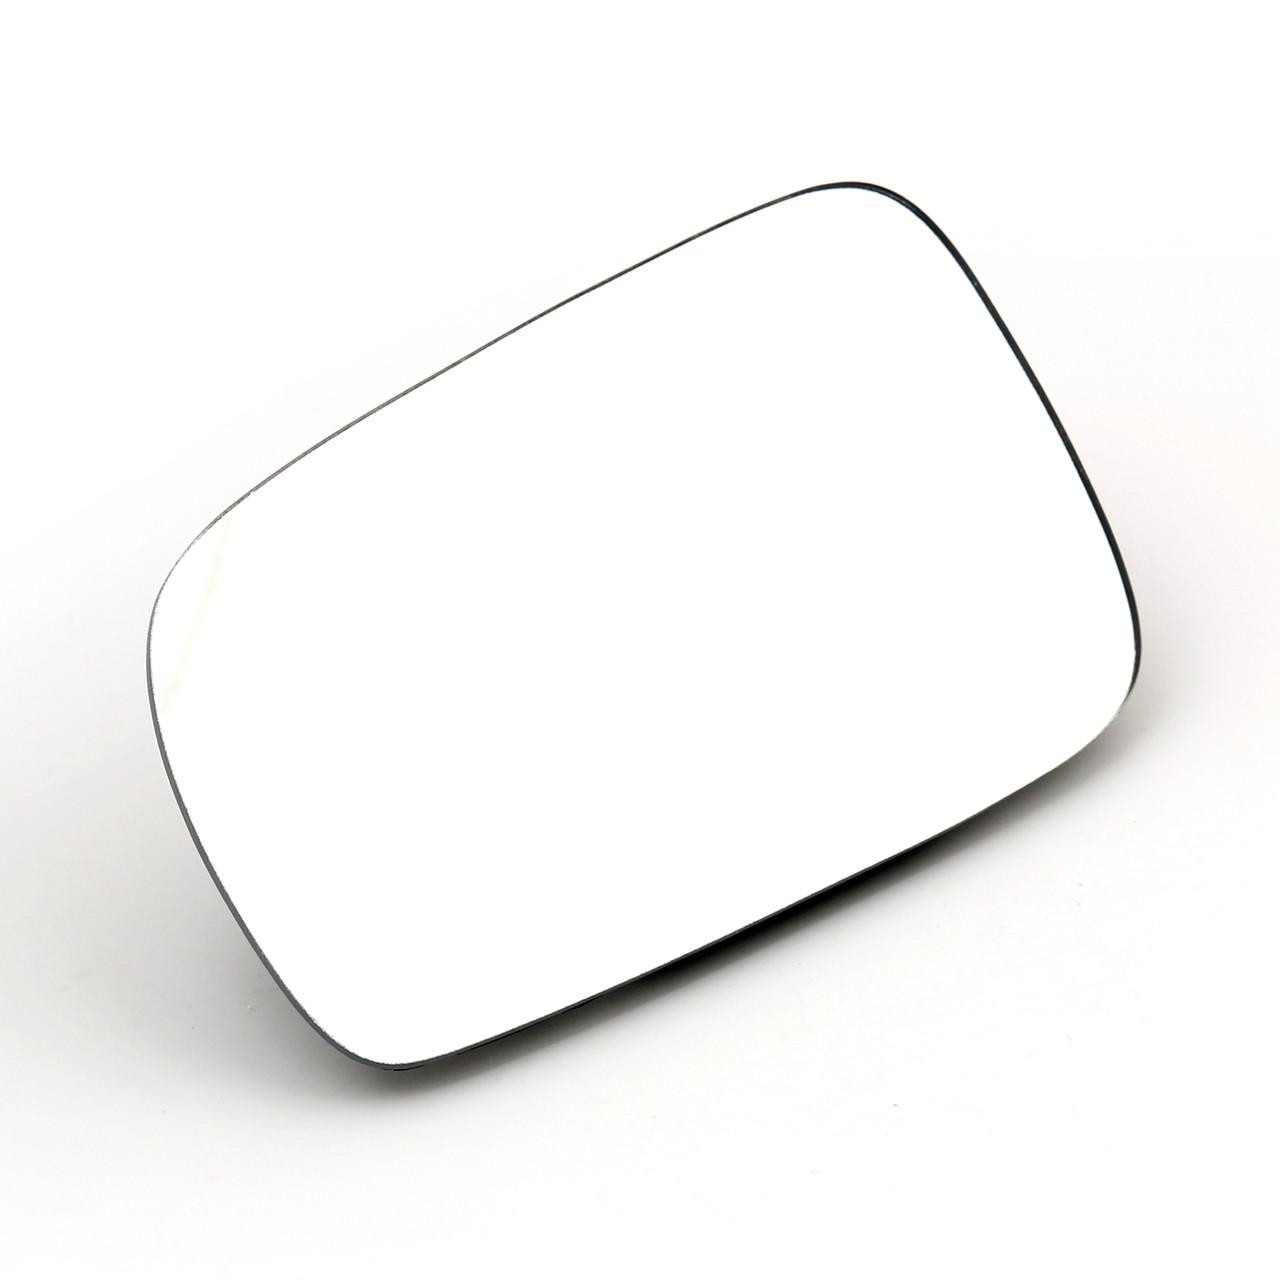 Left Heater Mirror Door Glass VW Jetta MK4 Passat B5 Bora Golf MK4 (99-04)